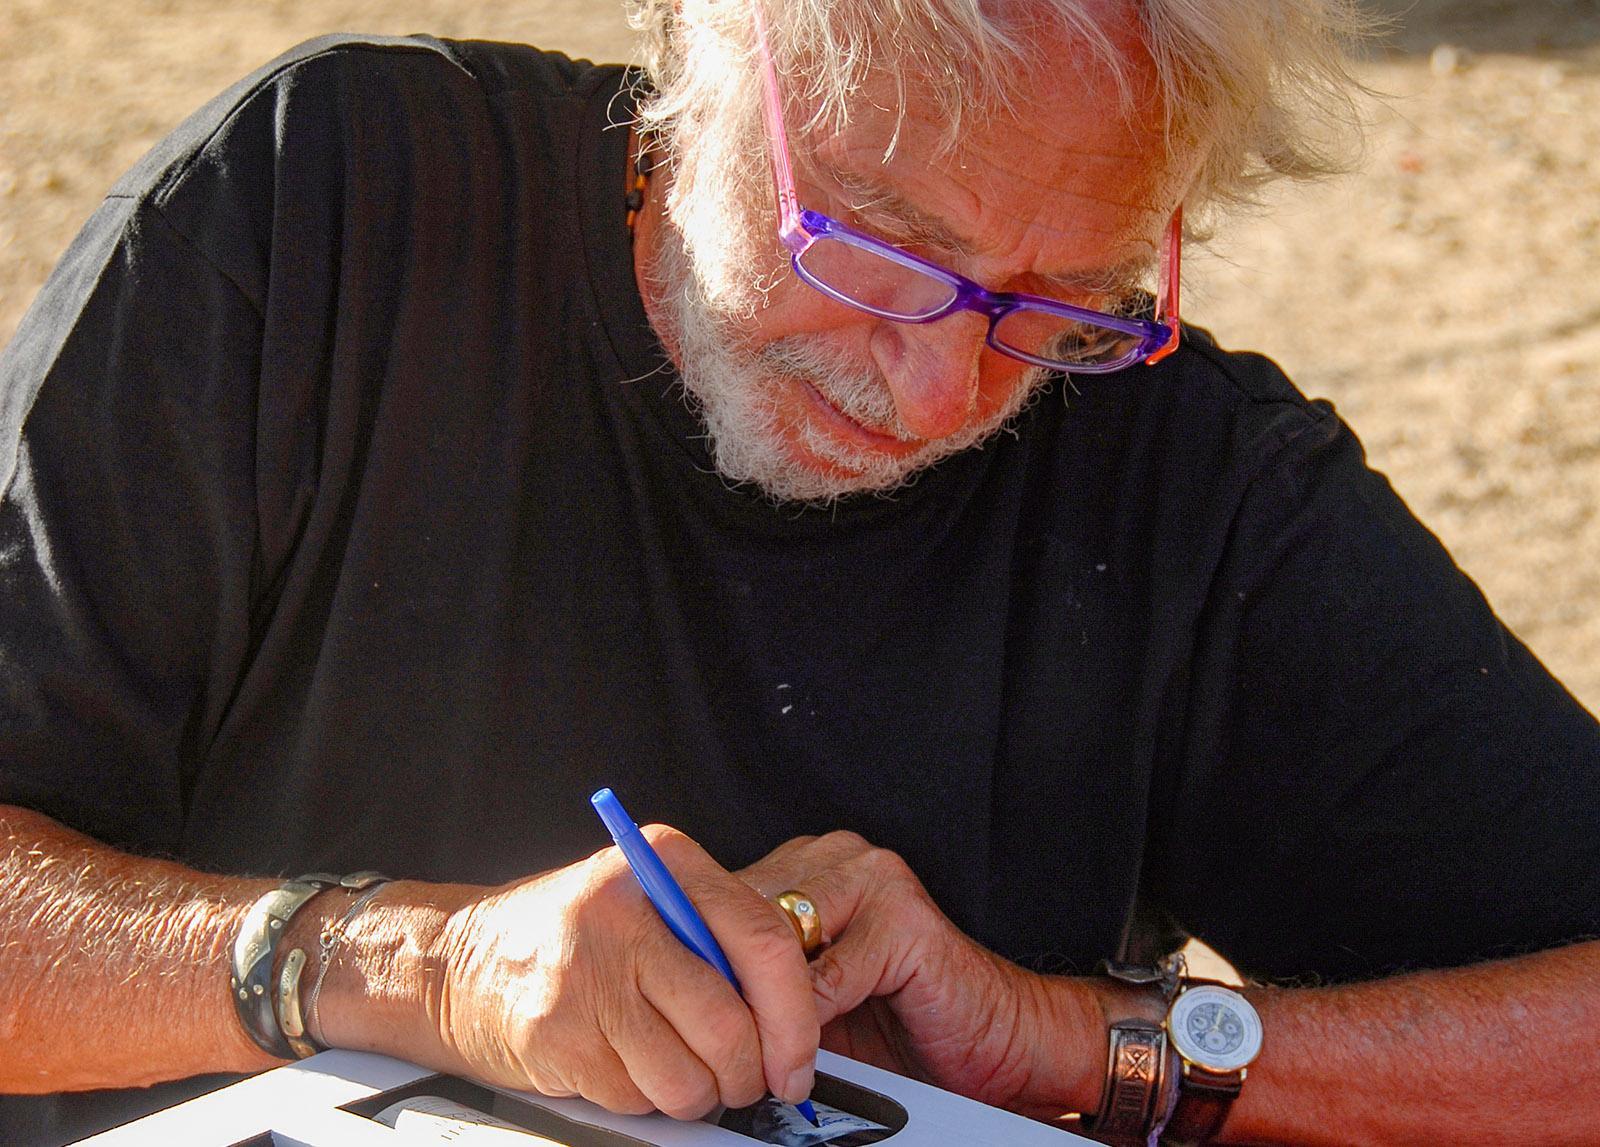 F/Languedoc-Roussillon/Gruissan: Château Bel Évêque, Schauspieler Pierre Richard signiert seine Flaschen. Foto: Hilke Maunder